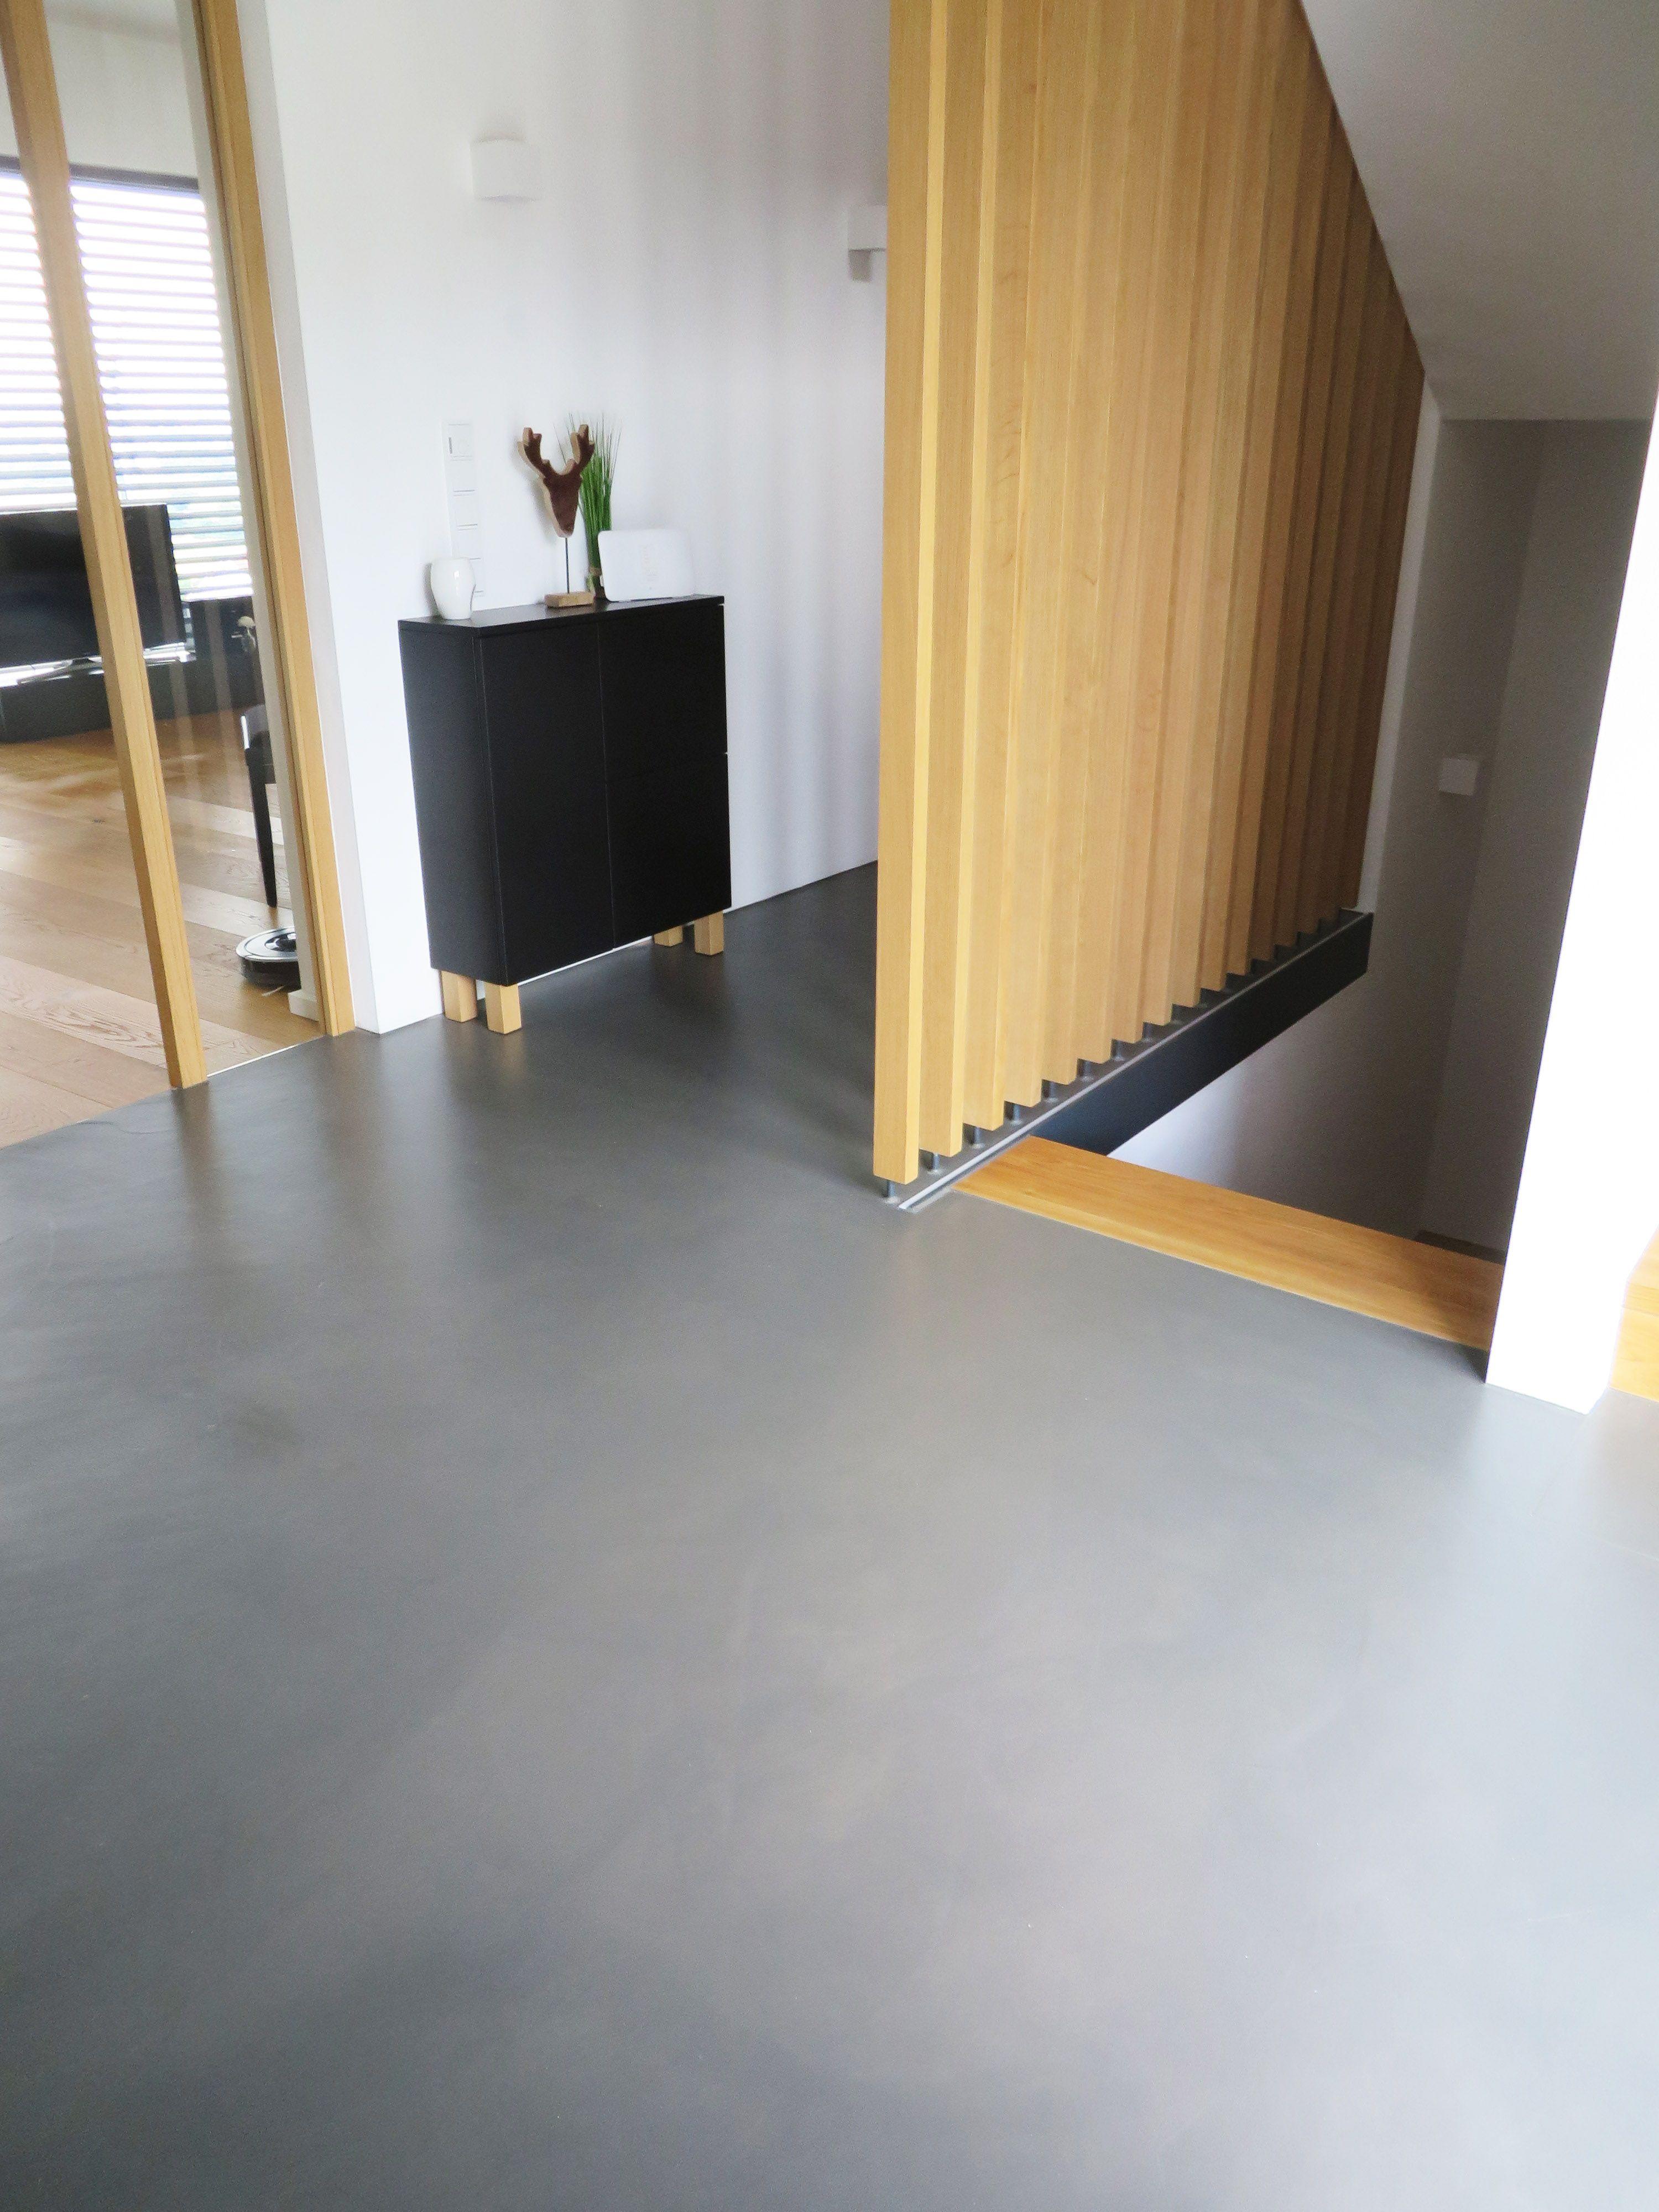 Floor Cement Zementboden Flur Betonfussboden Zuhause Treppenrenovierung